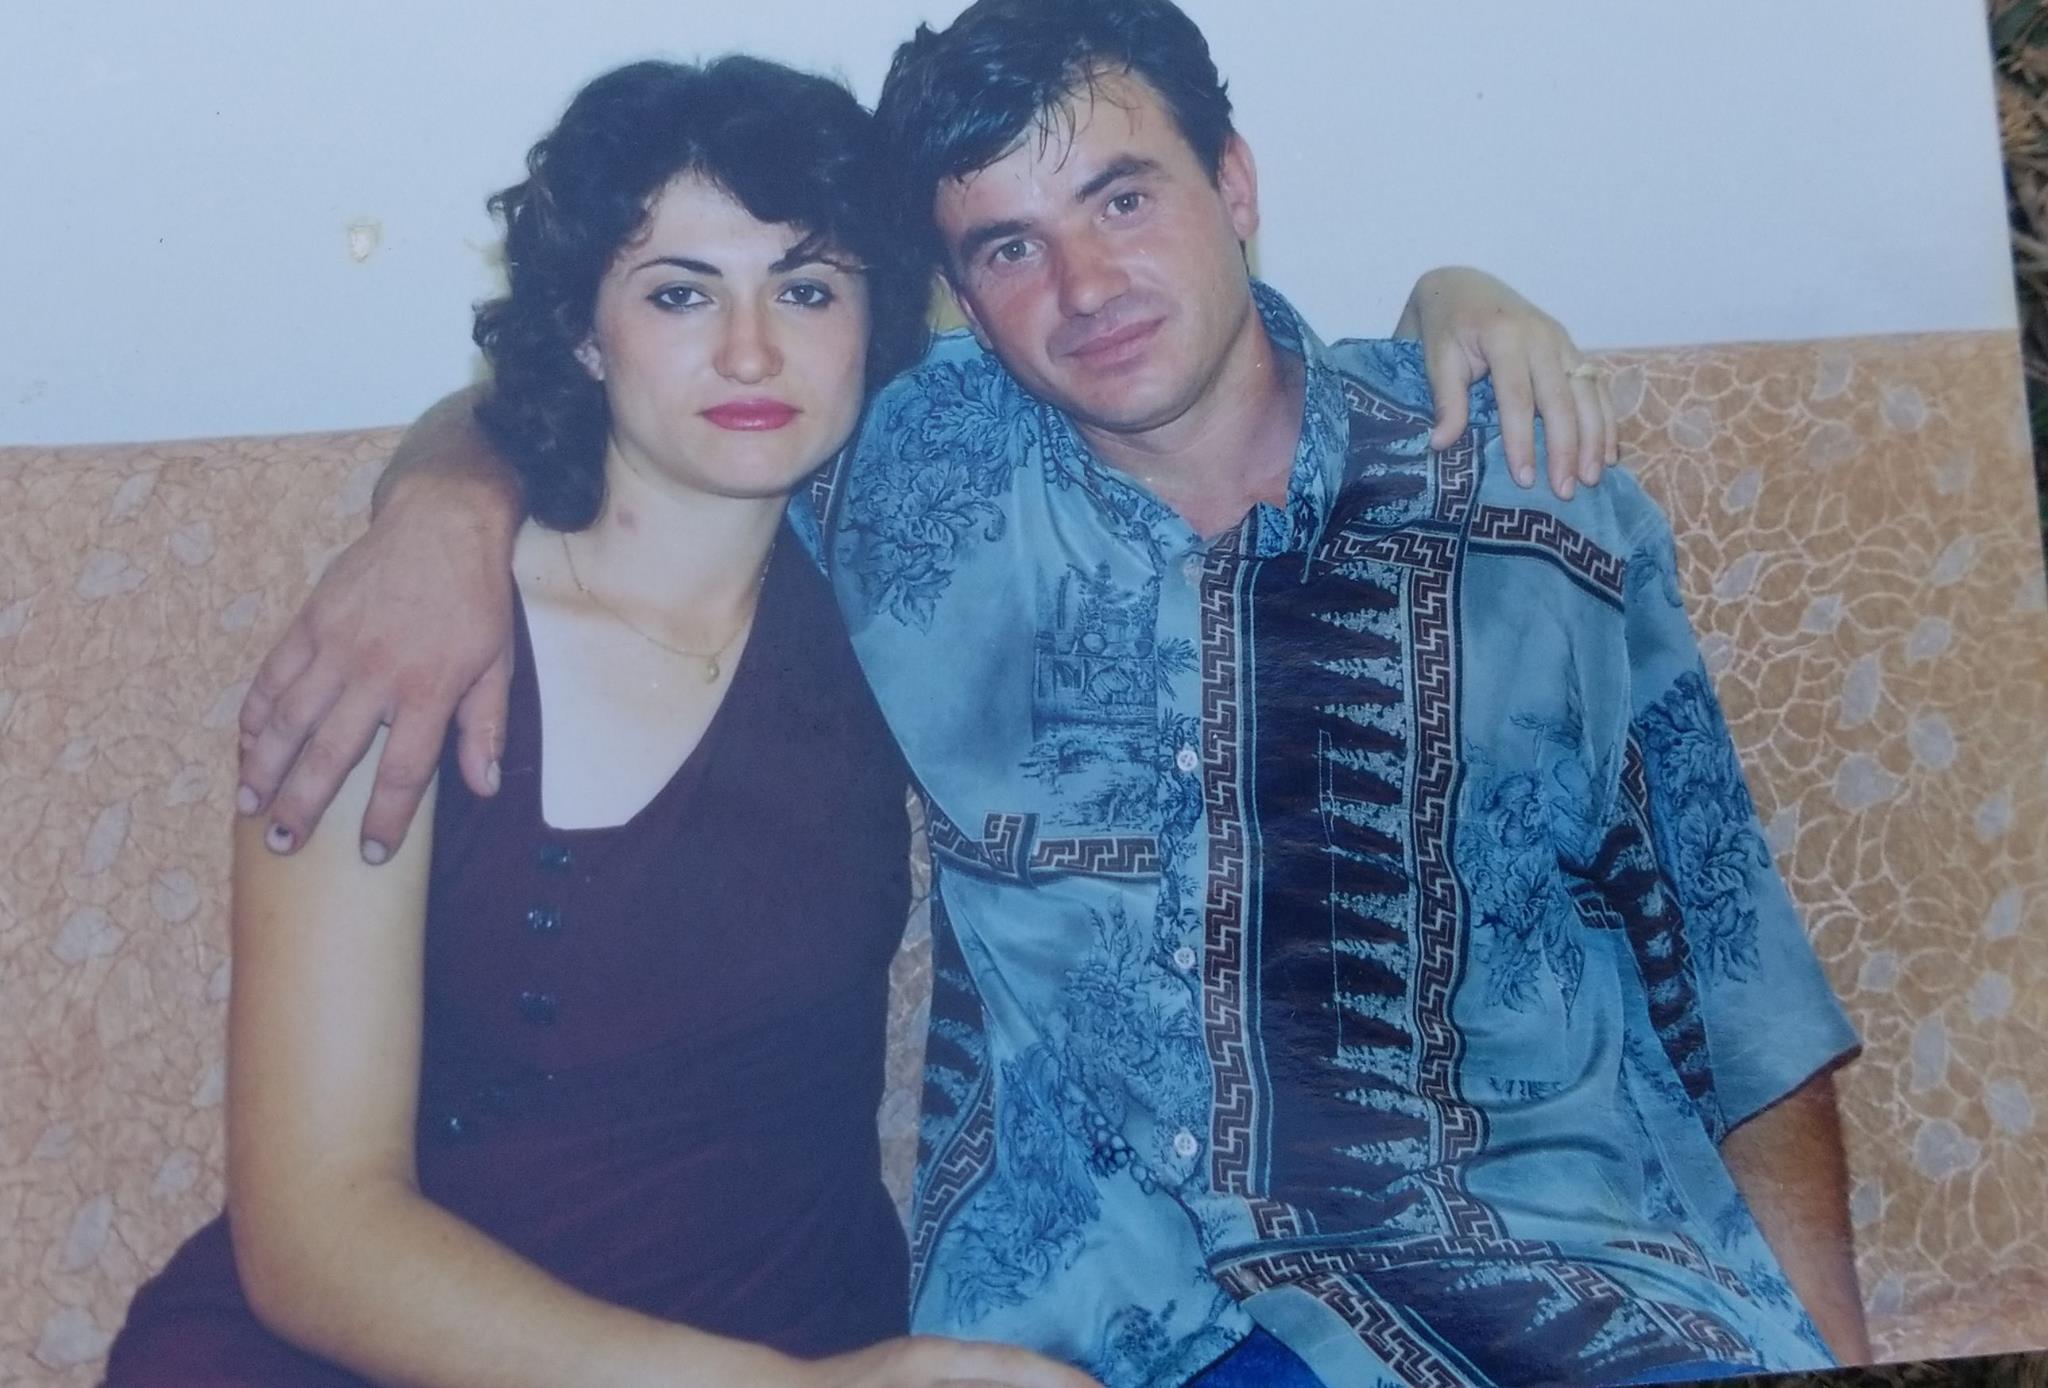 Vasilika-me-Besimin